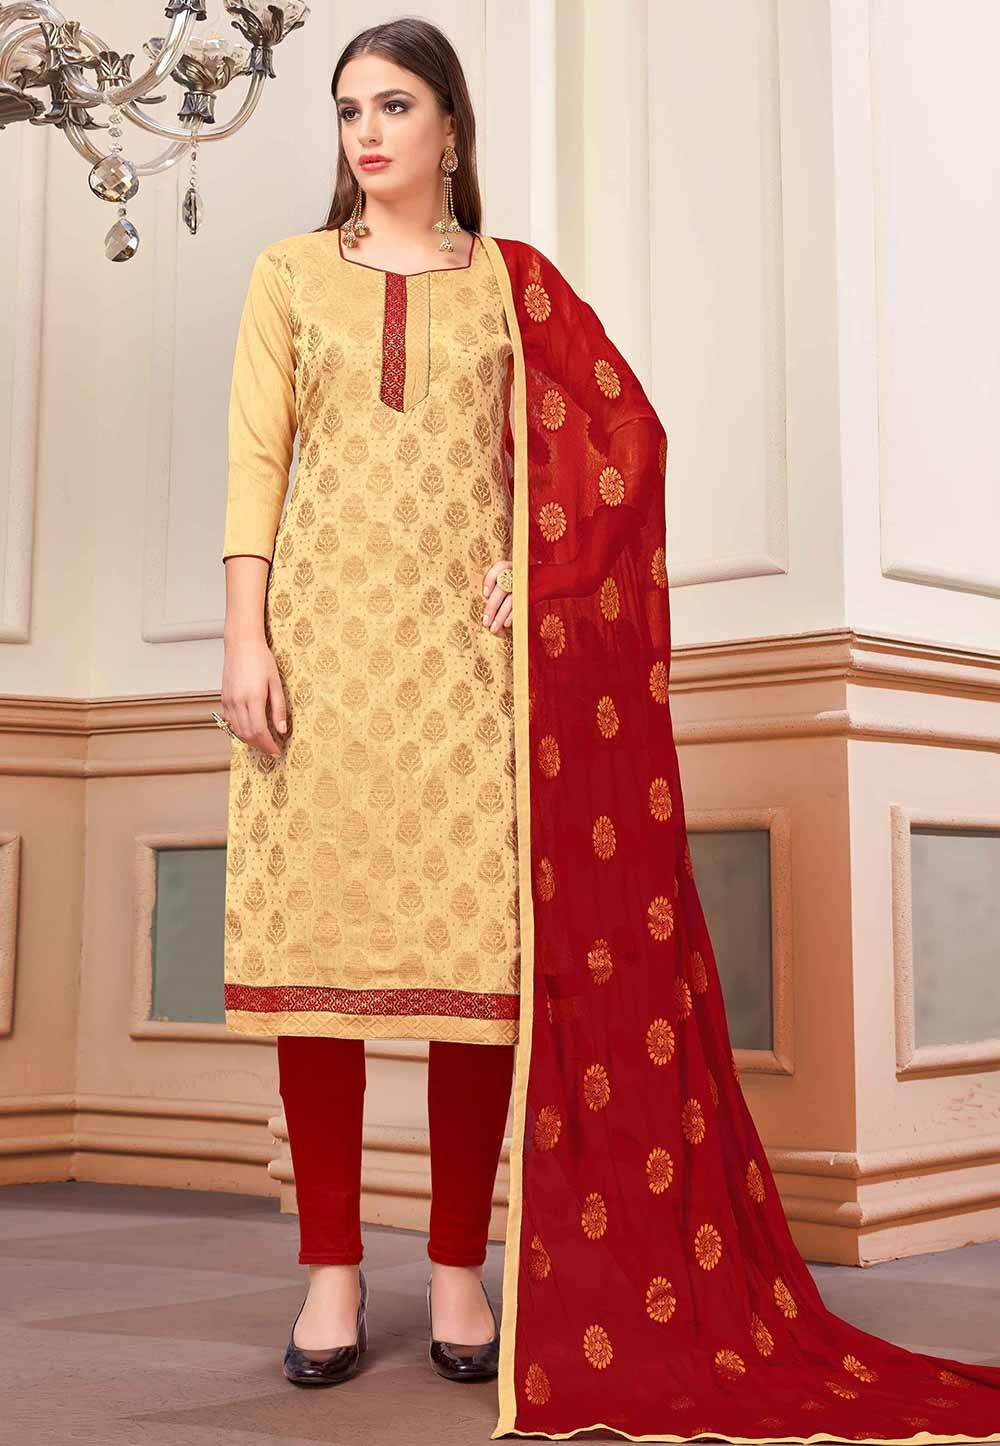 Beige Colour Printed Salwar Kameez